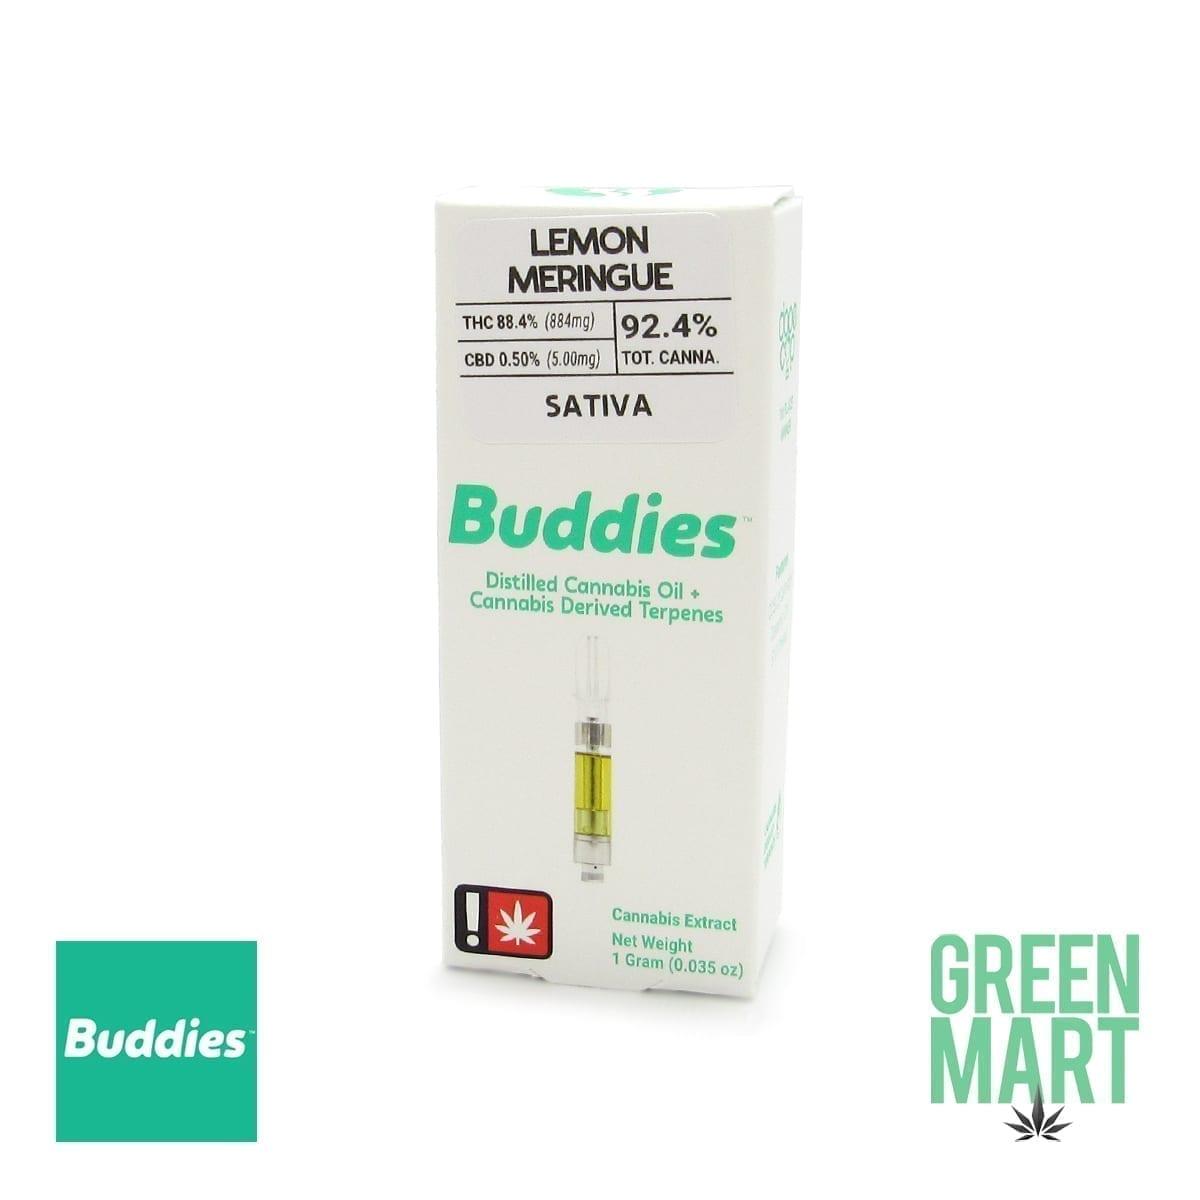 Buddies Brand Distillate Cartridge - Lemon Meringue